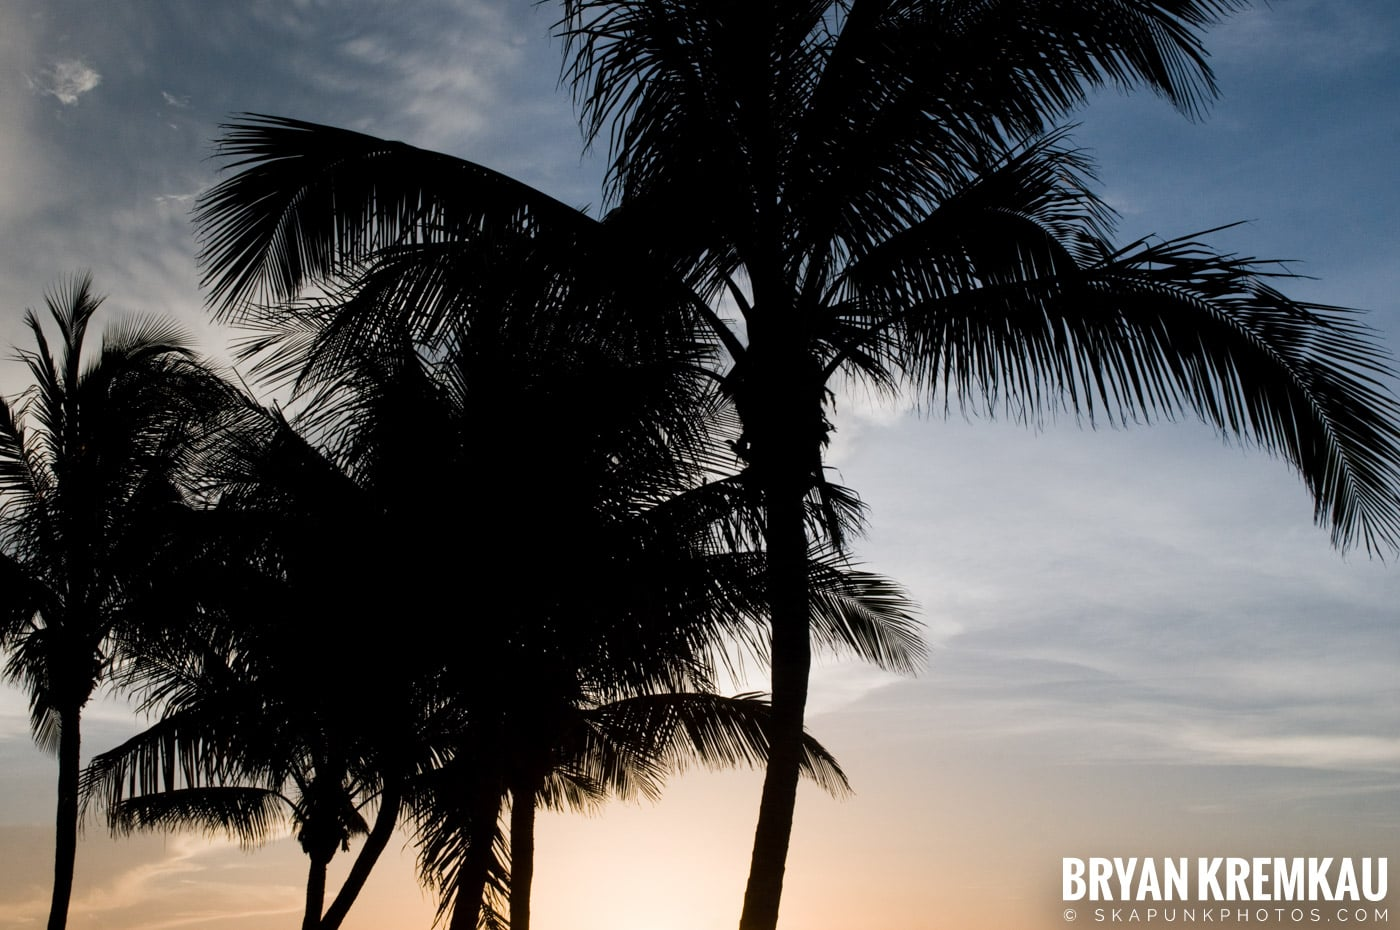 Florida Keys Vacation - 7.09.10 - 7.15.10 (82)